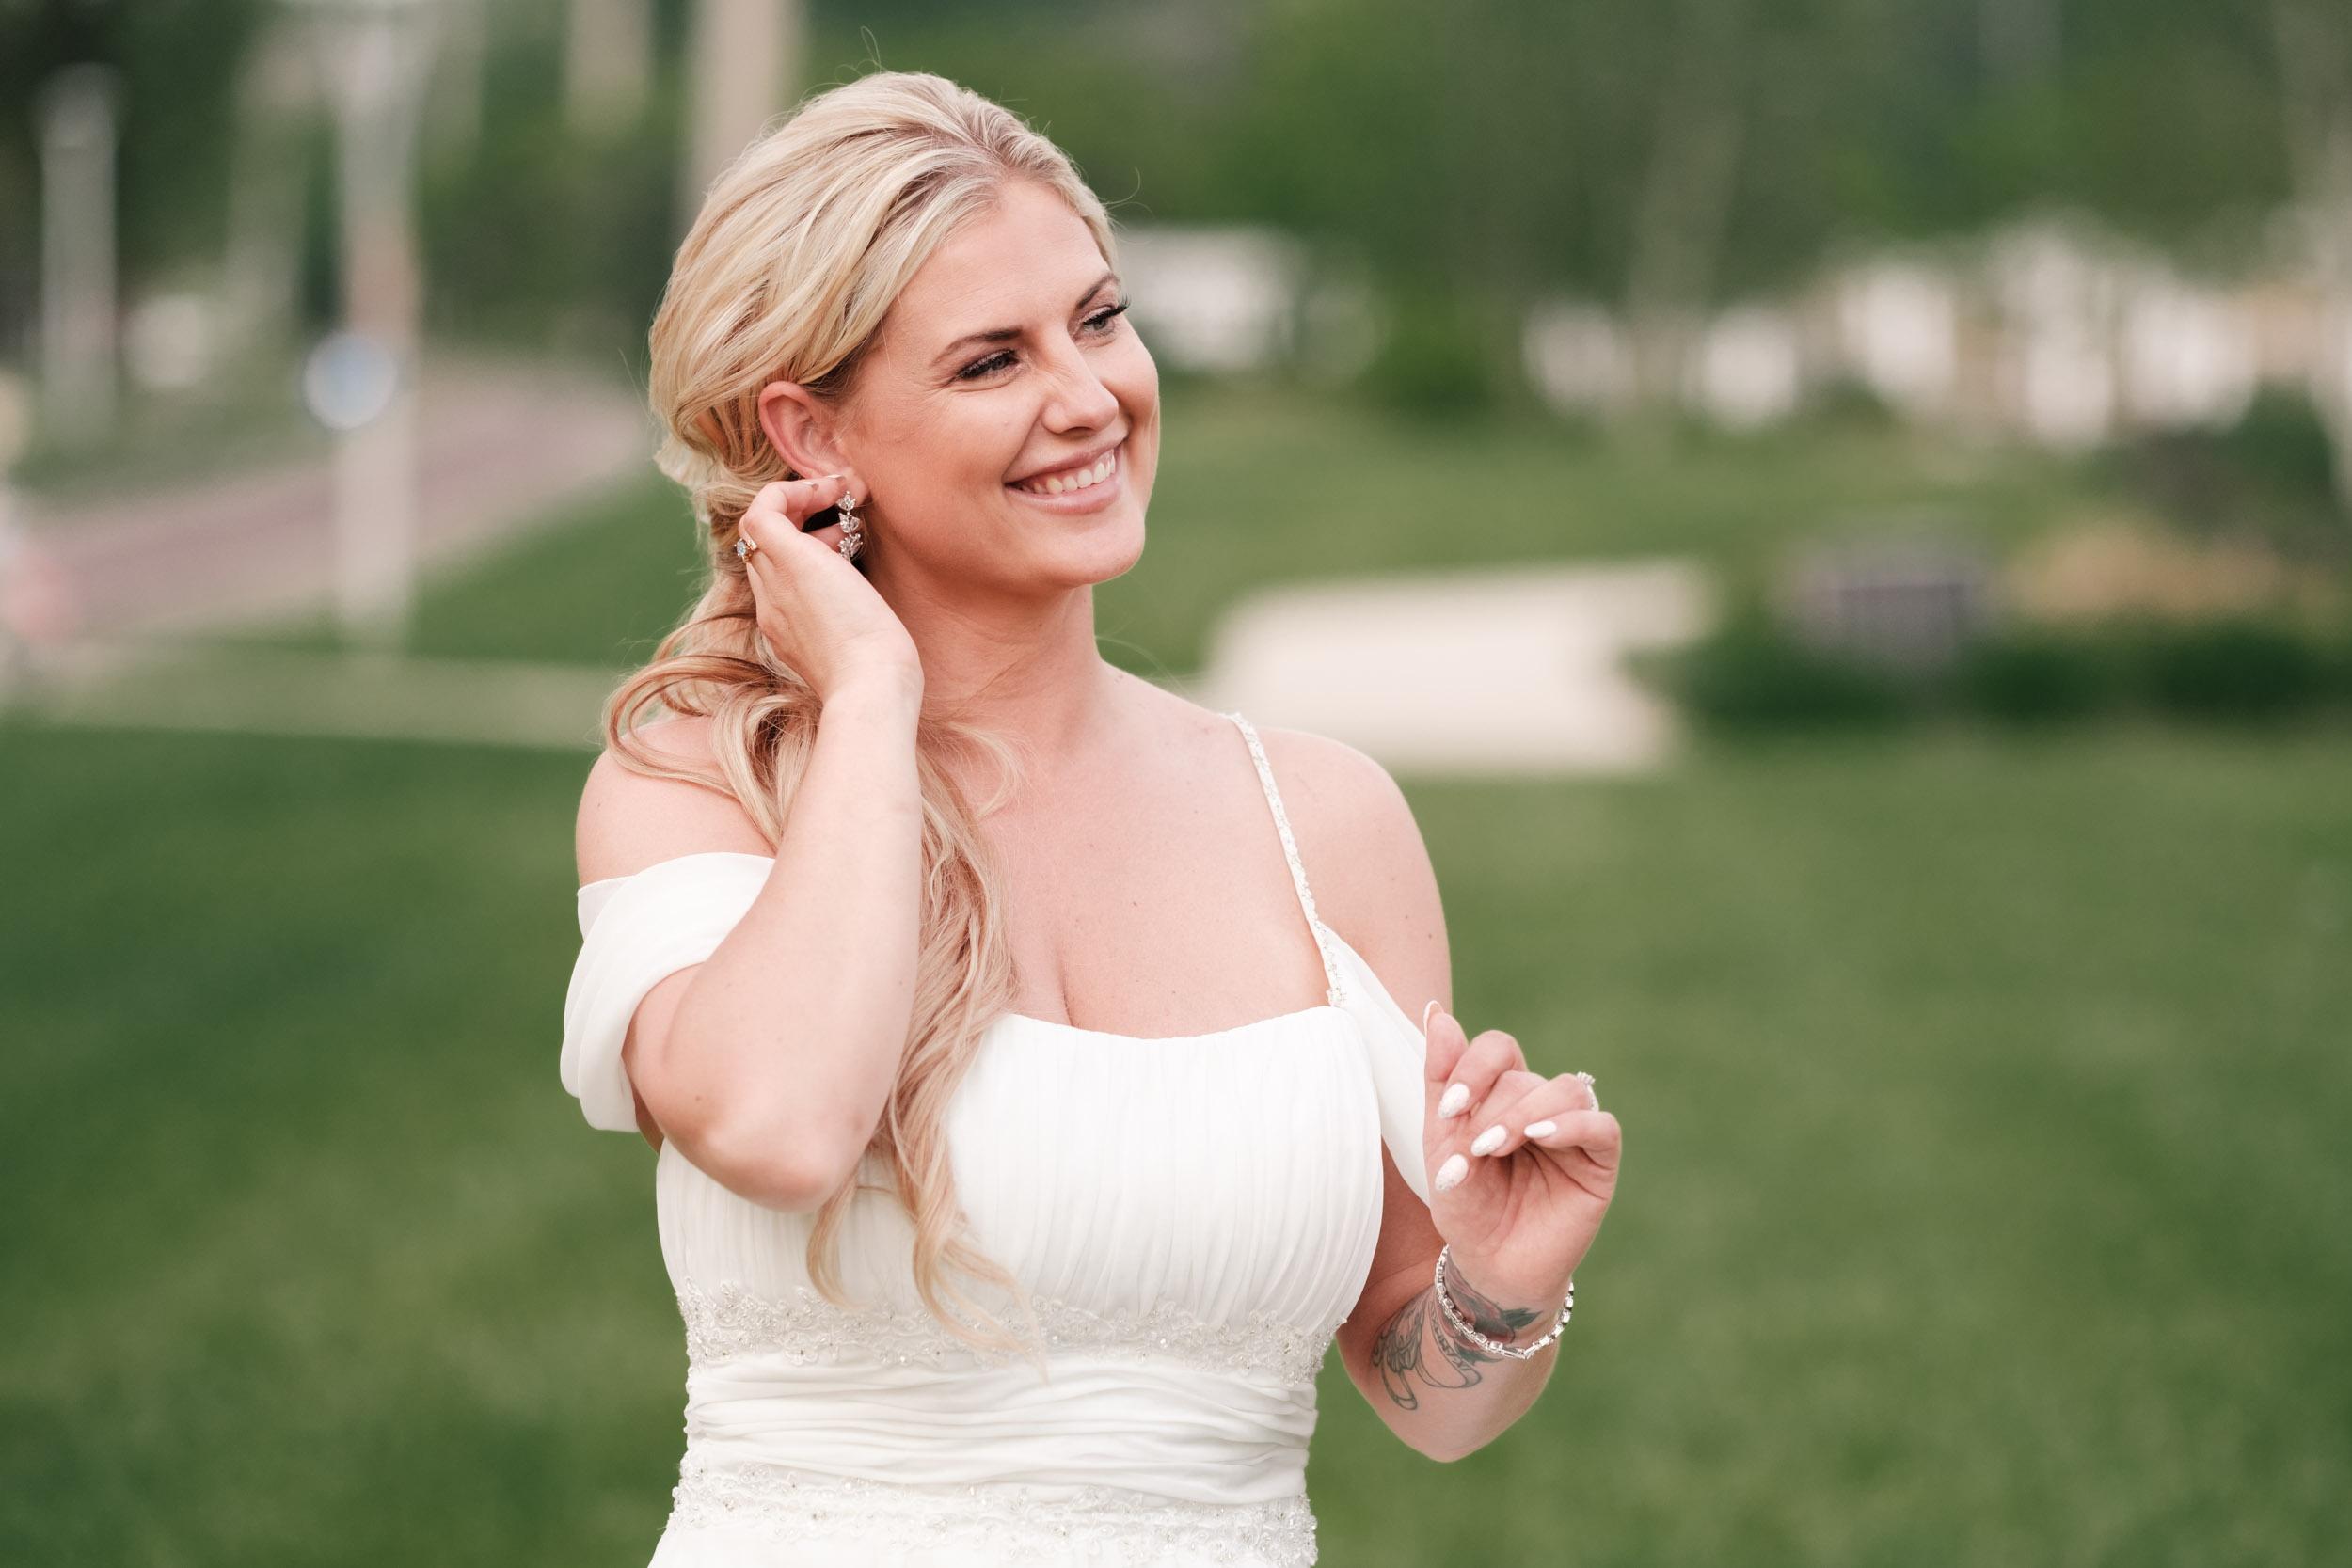 19-06-01 Megan Josh - Nicholas Conservatory Wedding-54.jpg